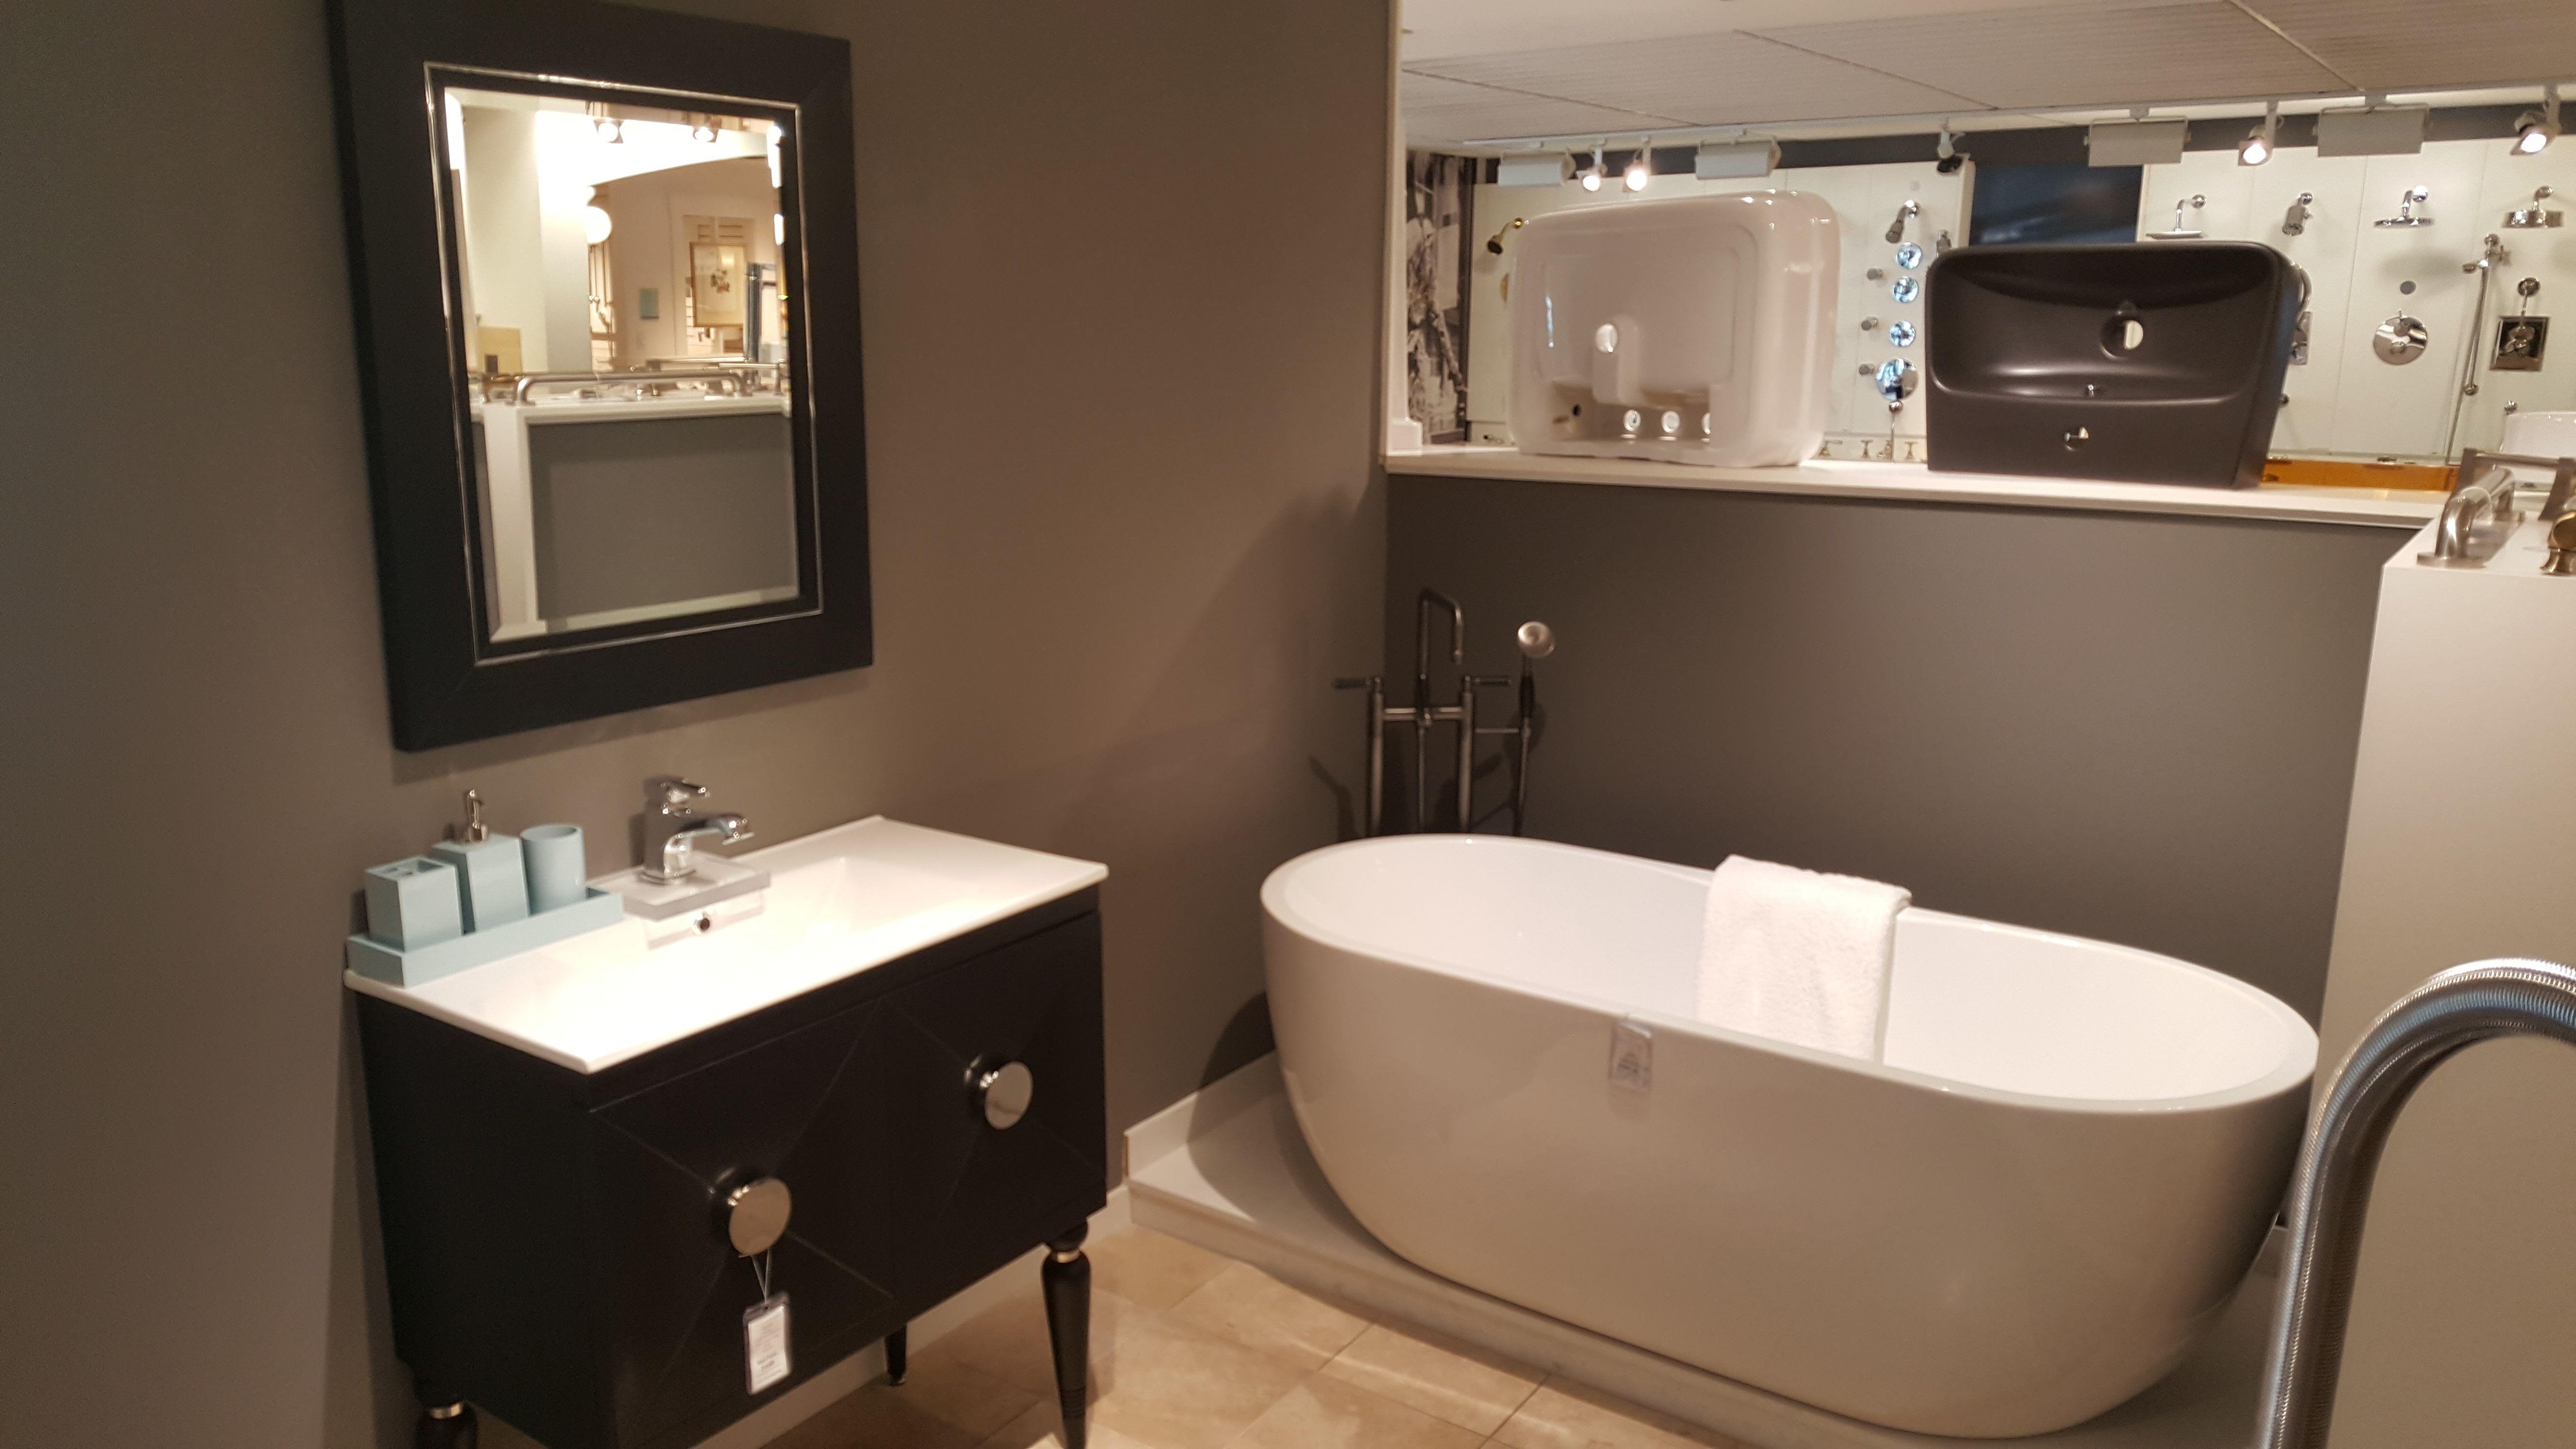 remodelers improvement contact us home bathtub reliable showroom bathroom